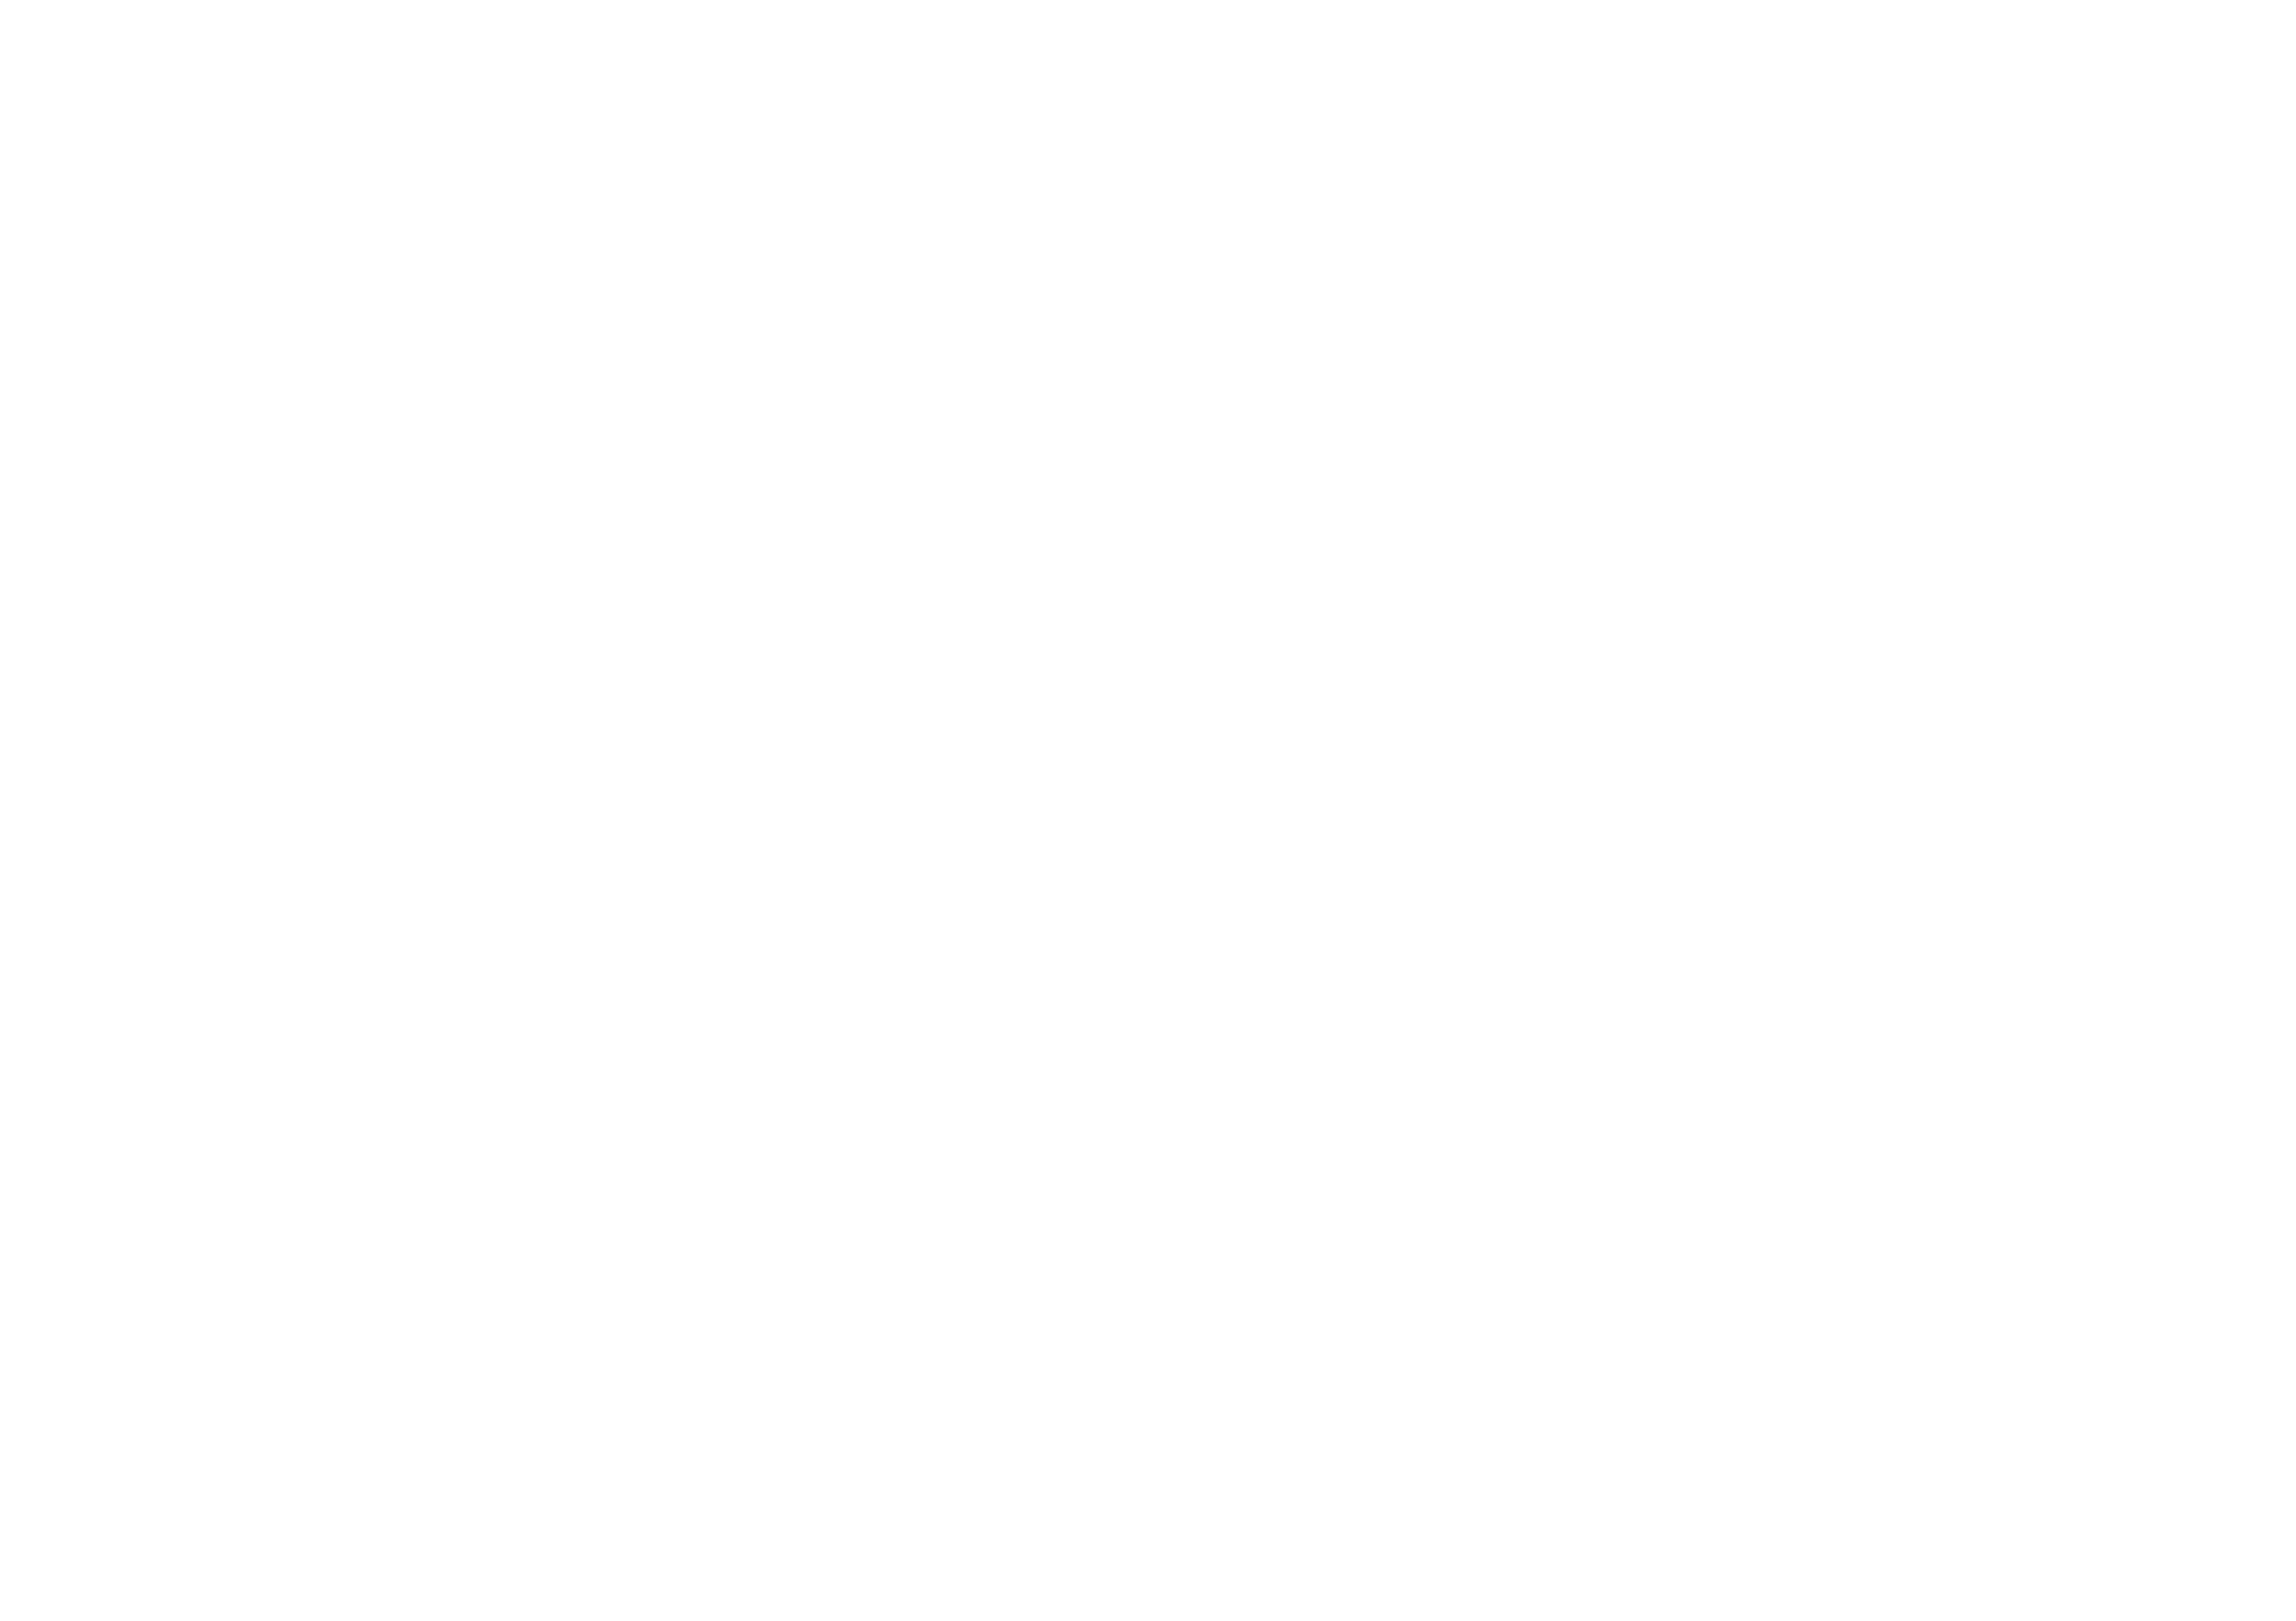 Swinomish Sports Bar & Grill